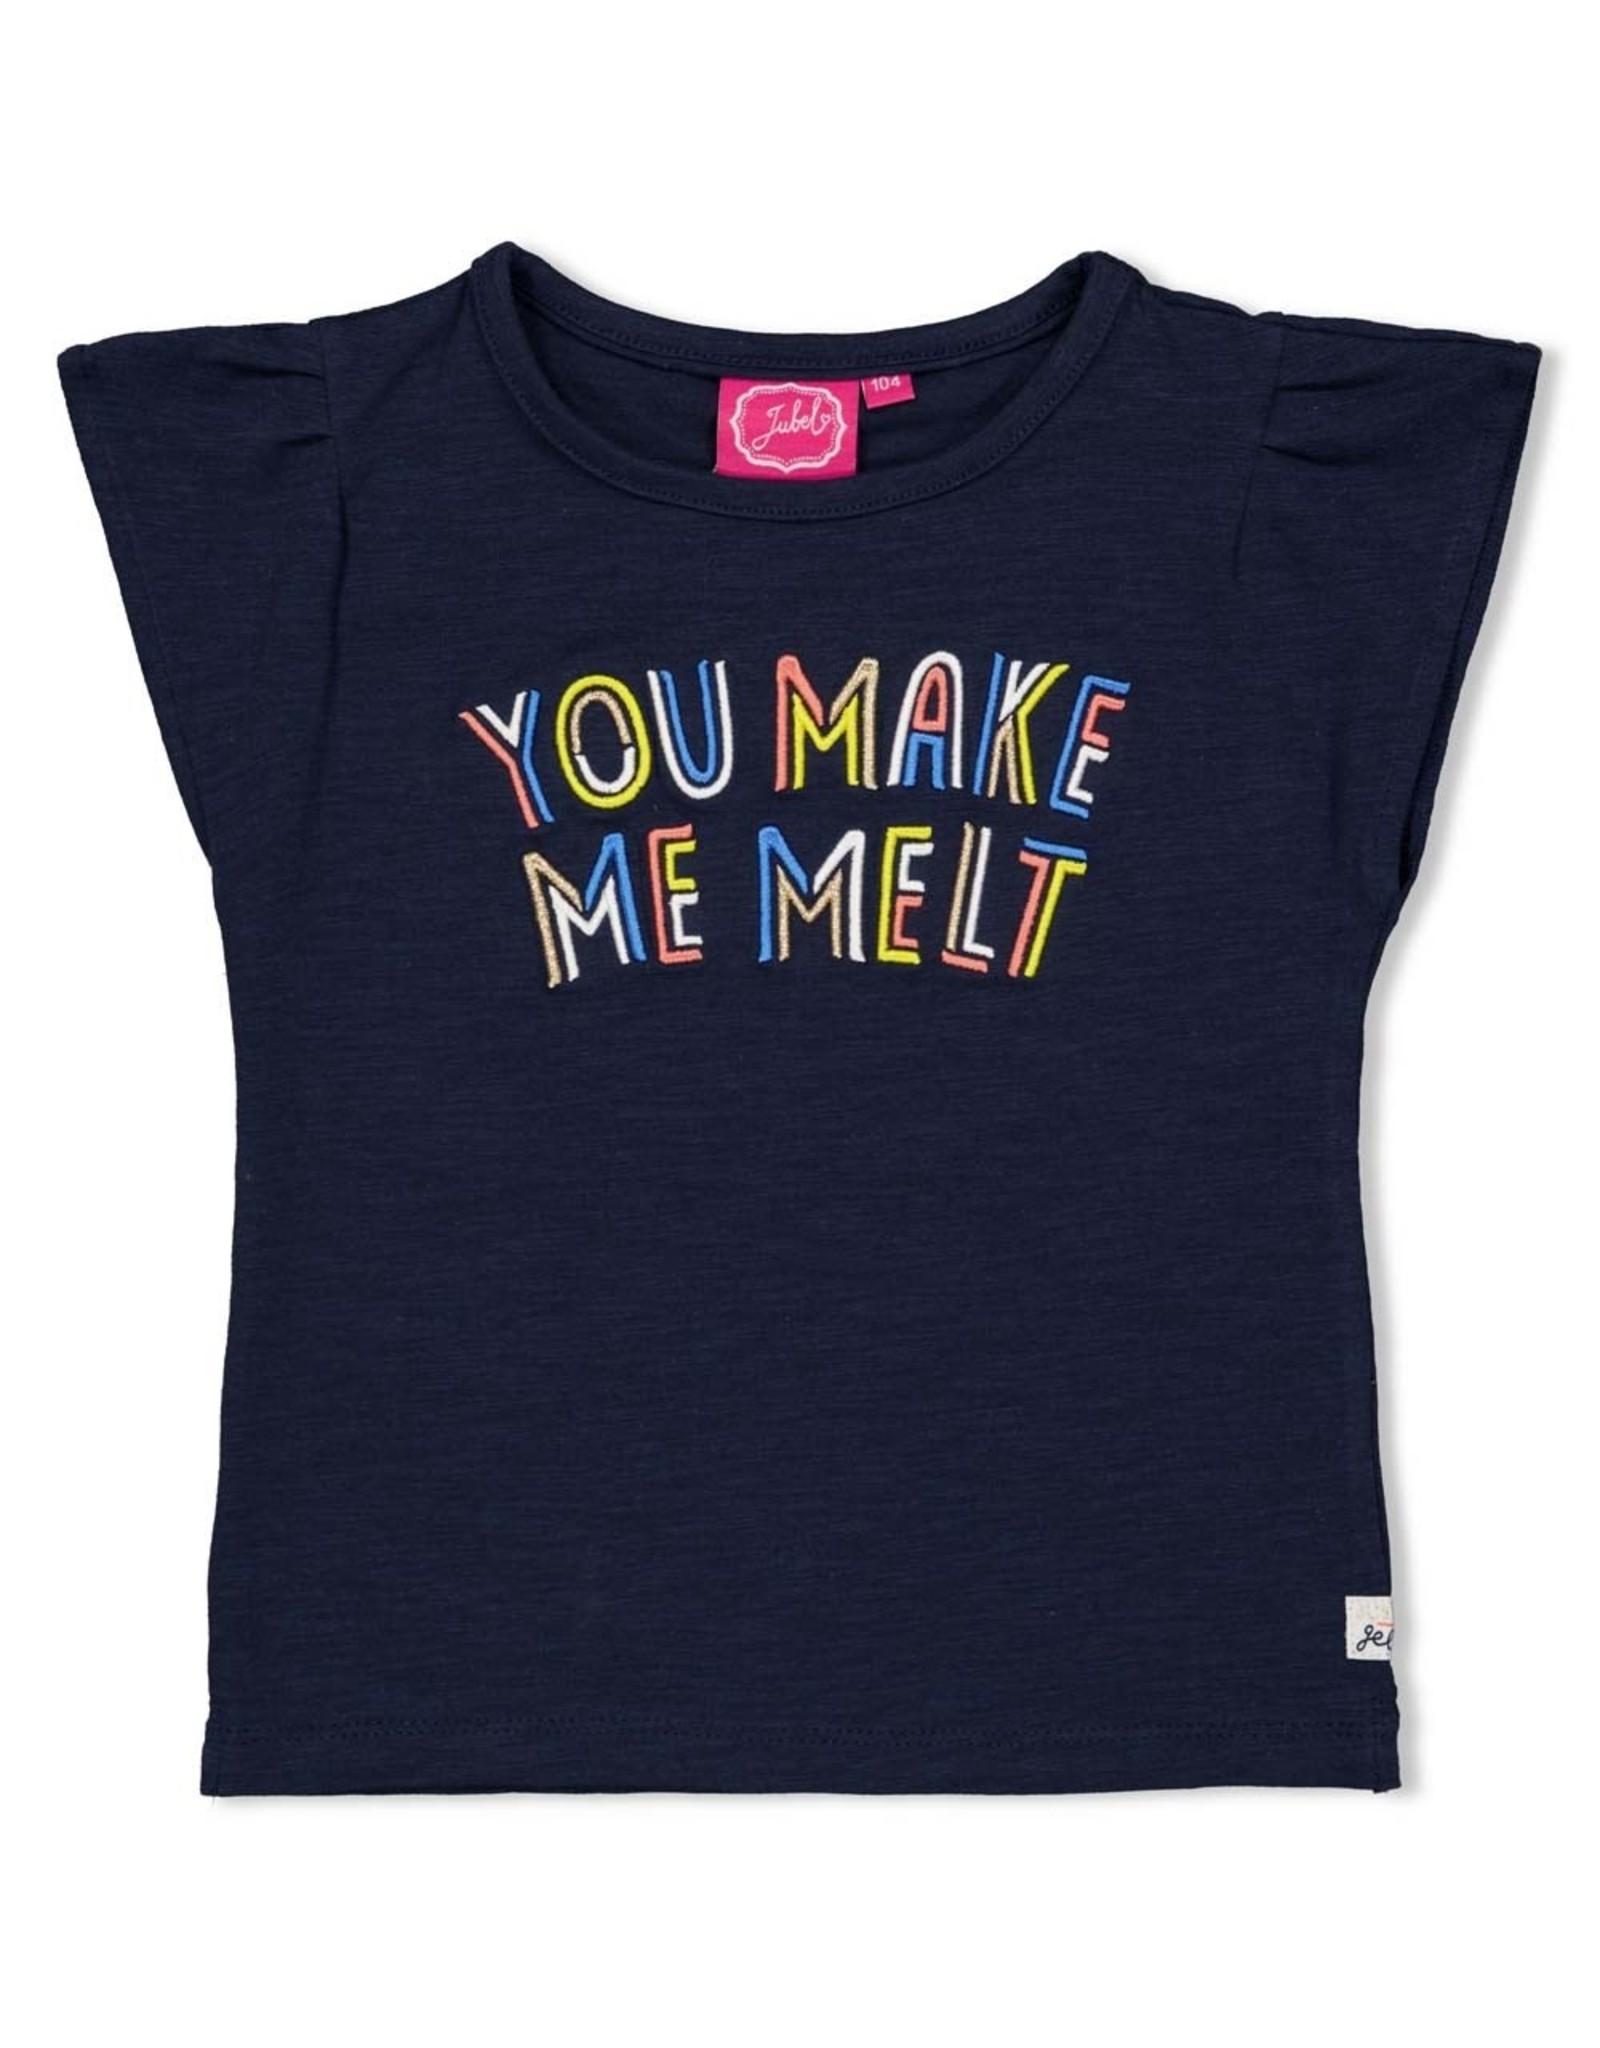 Jubel T-shirt Melt marine - Sweet Gelato